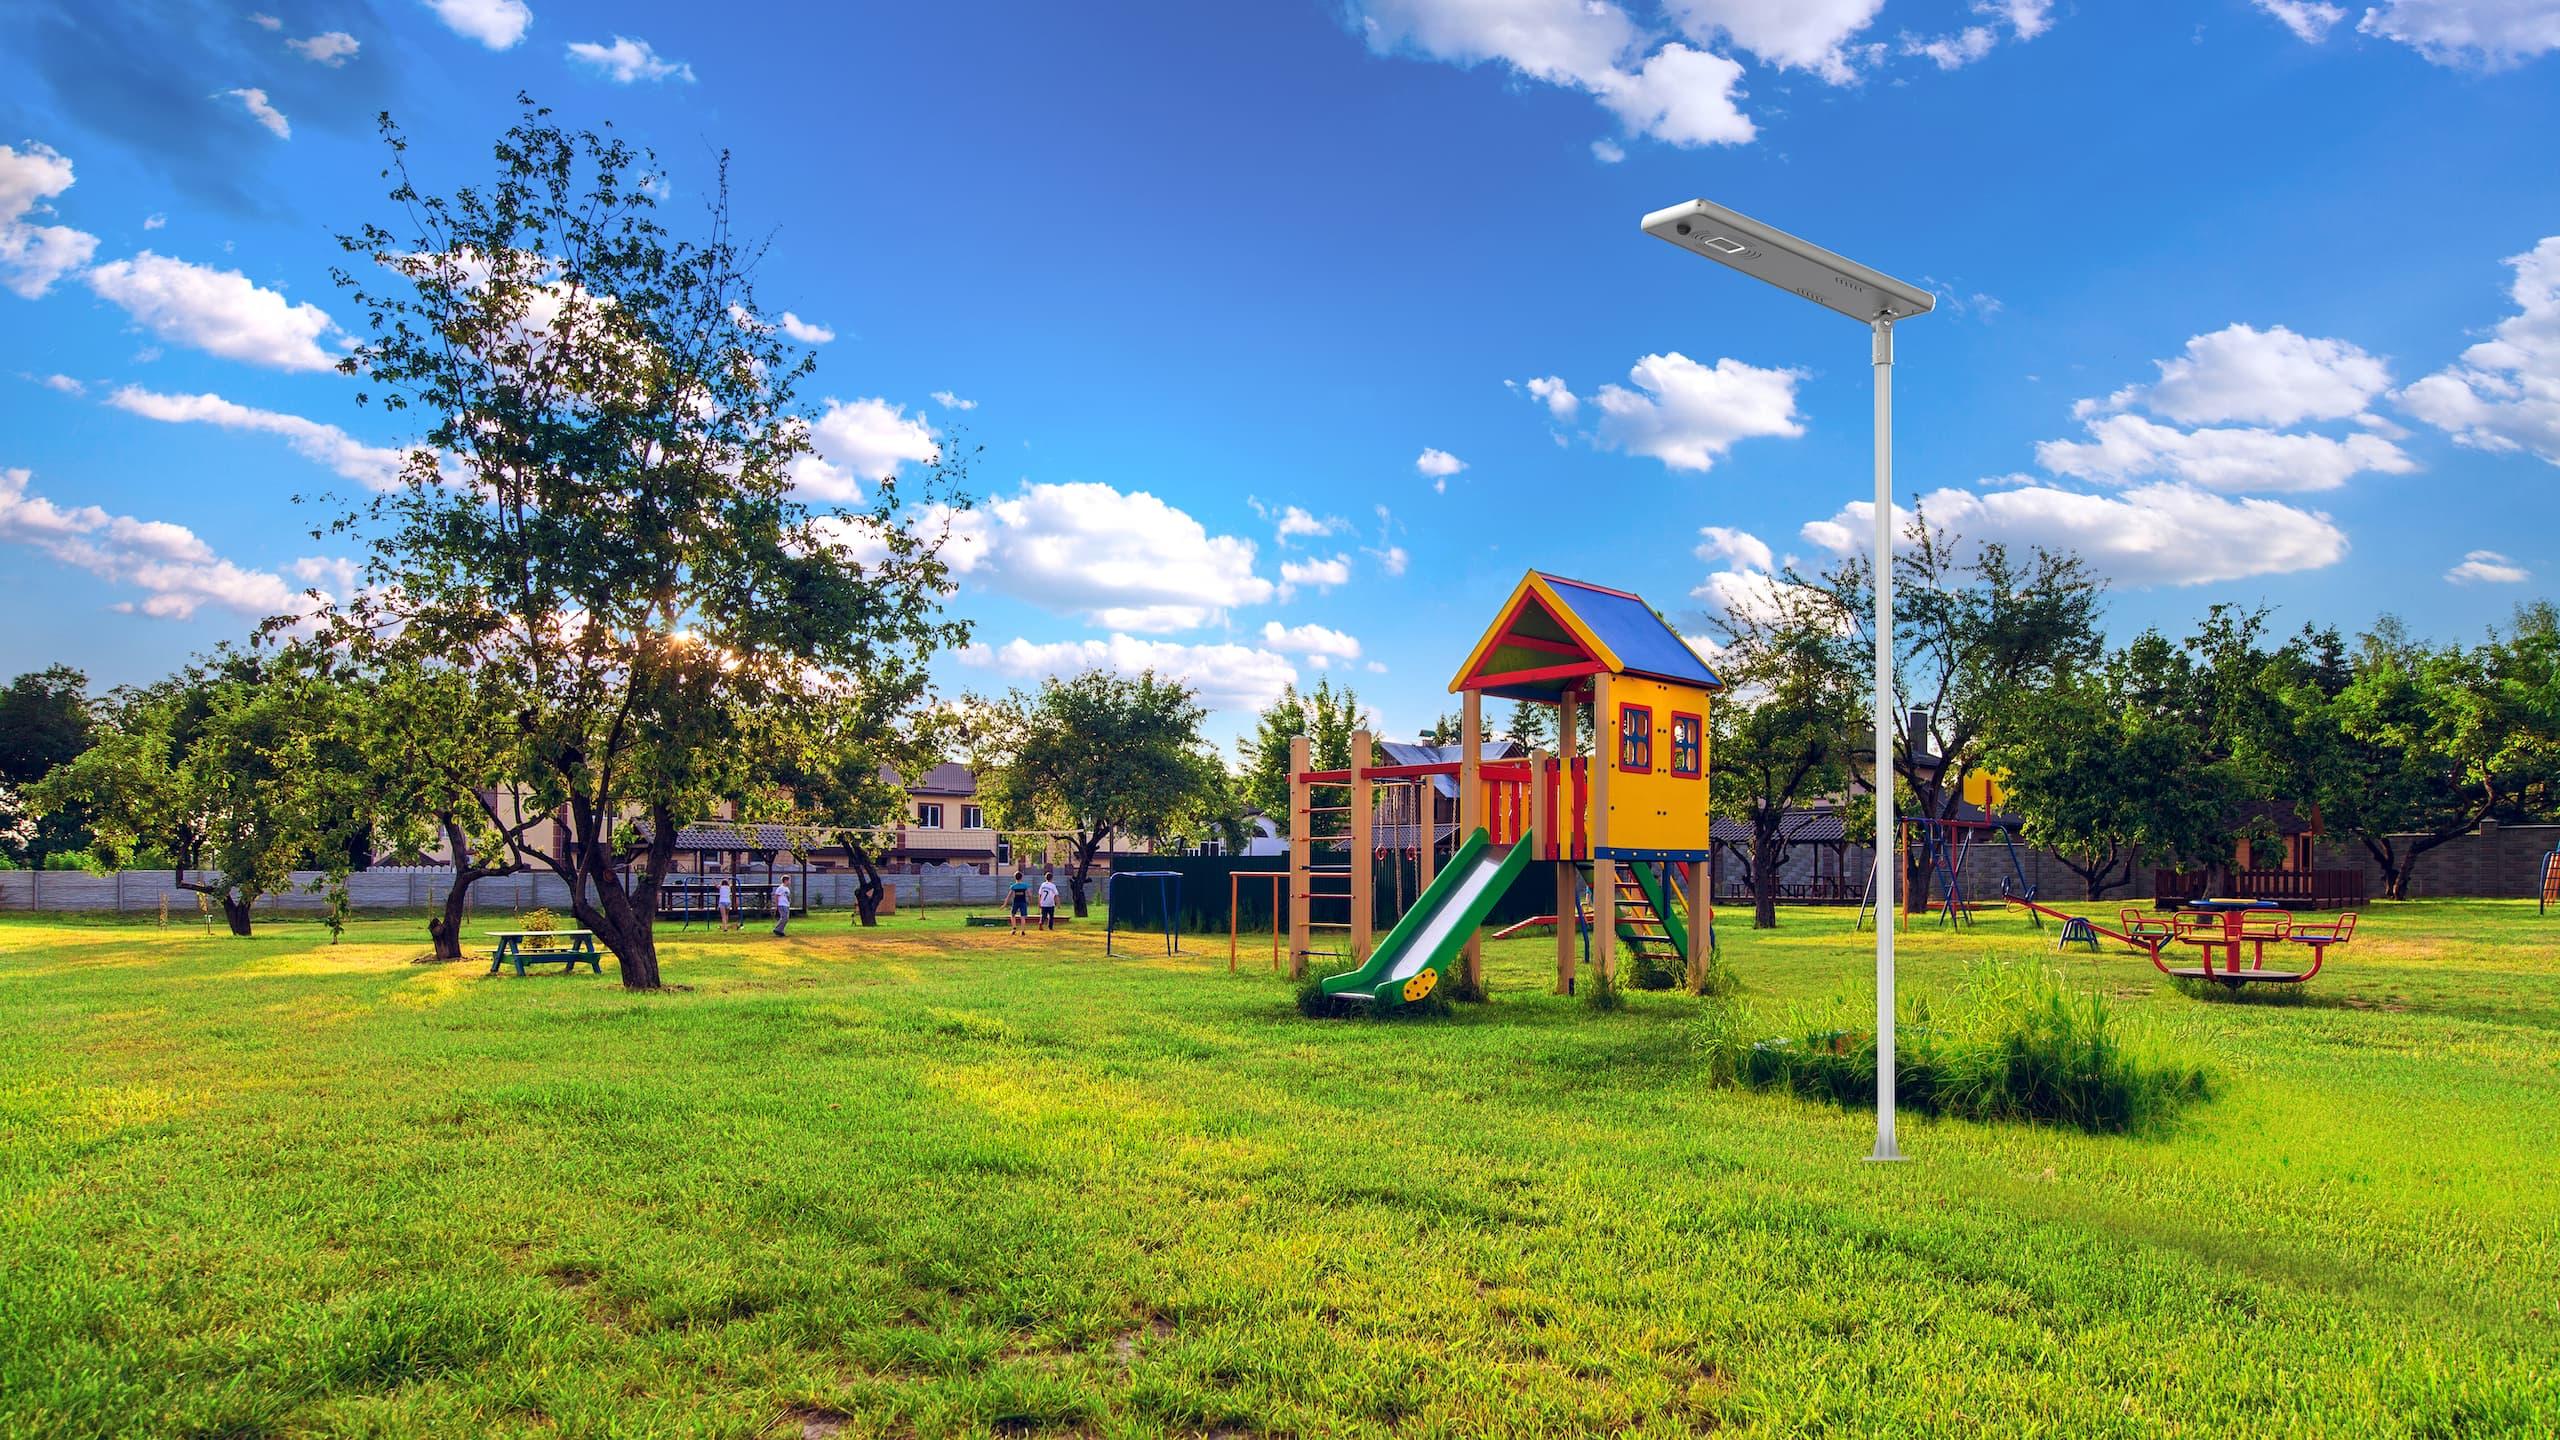 lightgogo-4-all-in-one-solar-street-light-installation-in-the park